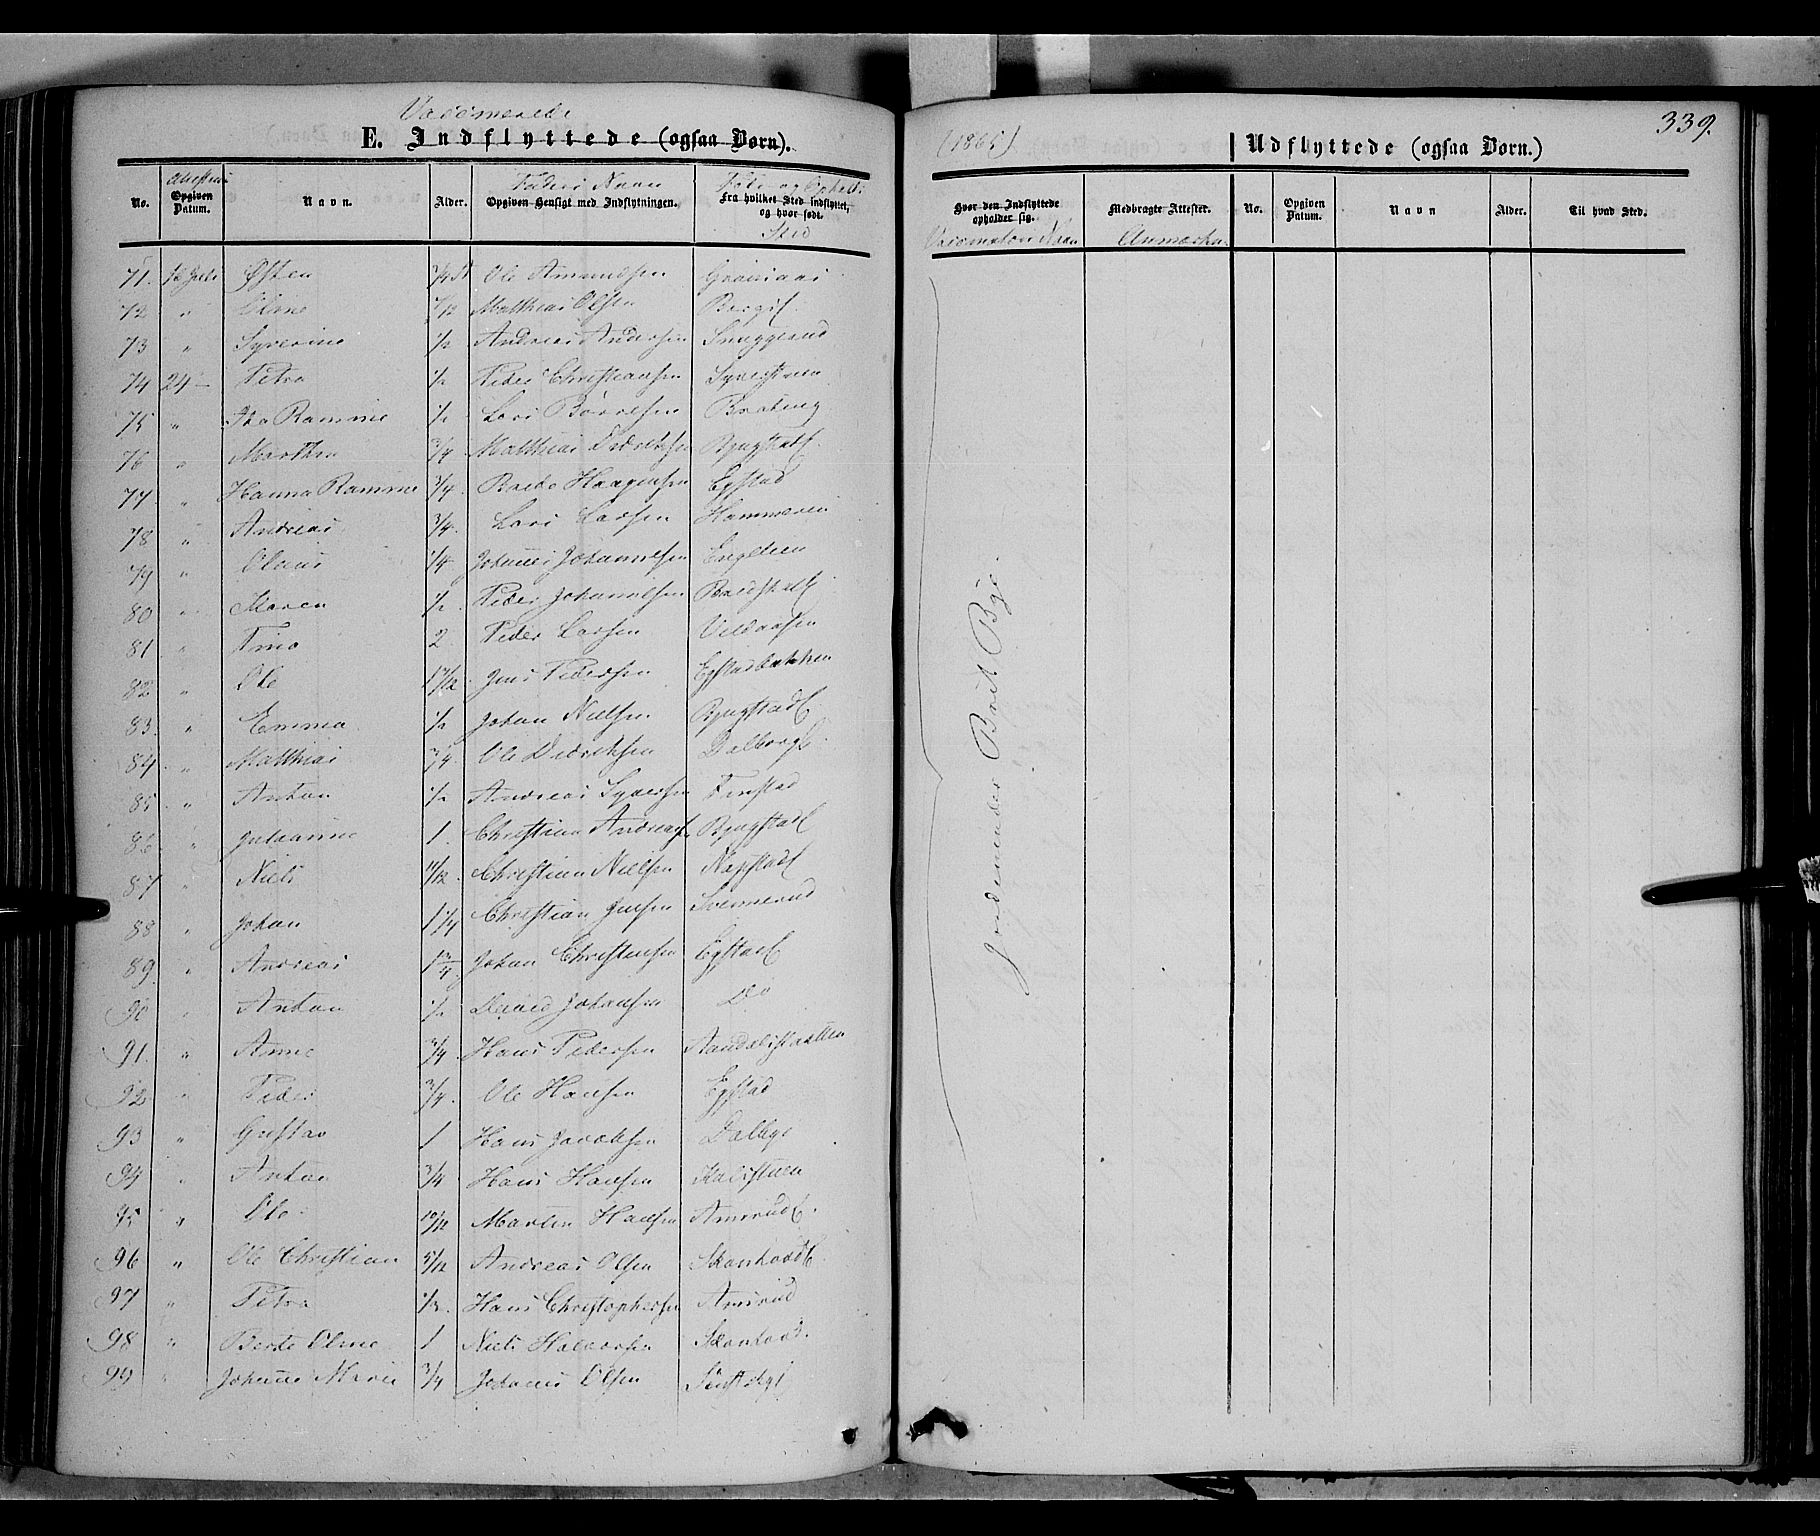 SAH, Vardal prestekontor, H/Ha/Haa/L0006: Ministerialbok nr. 6, 1854-1866, s. 339